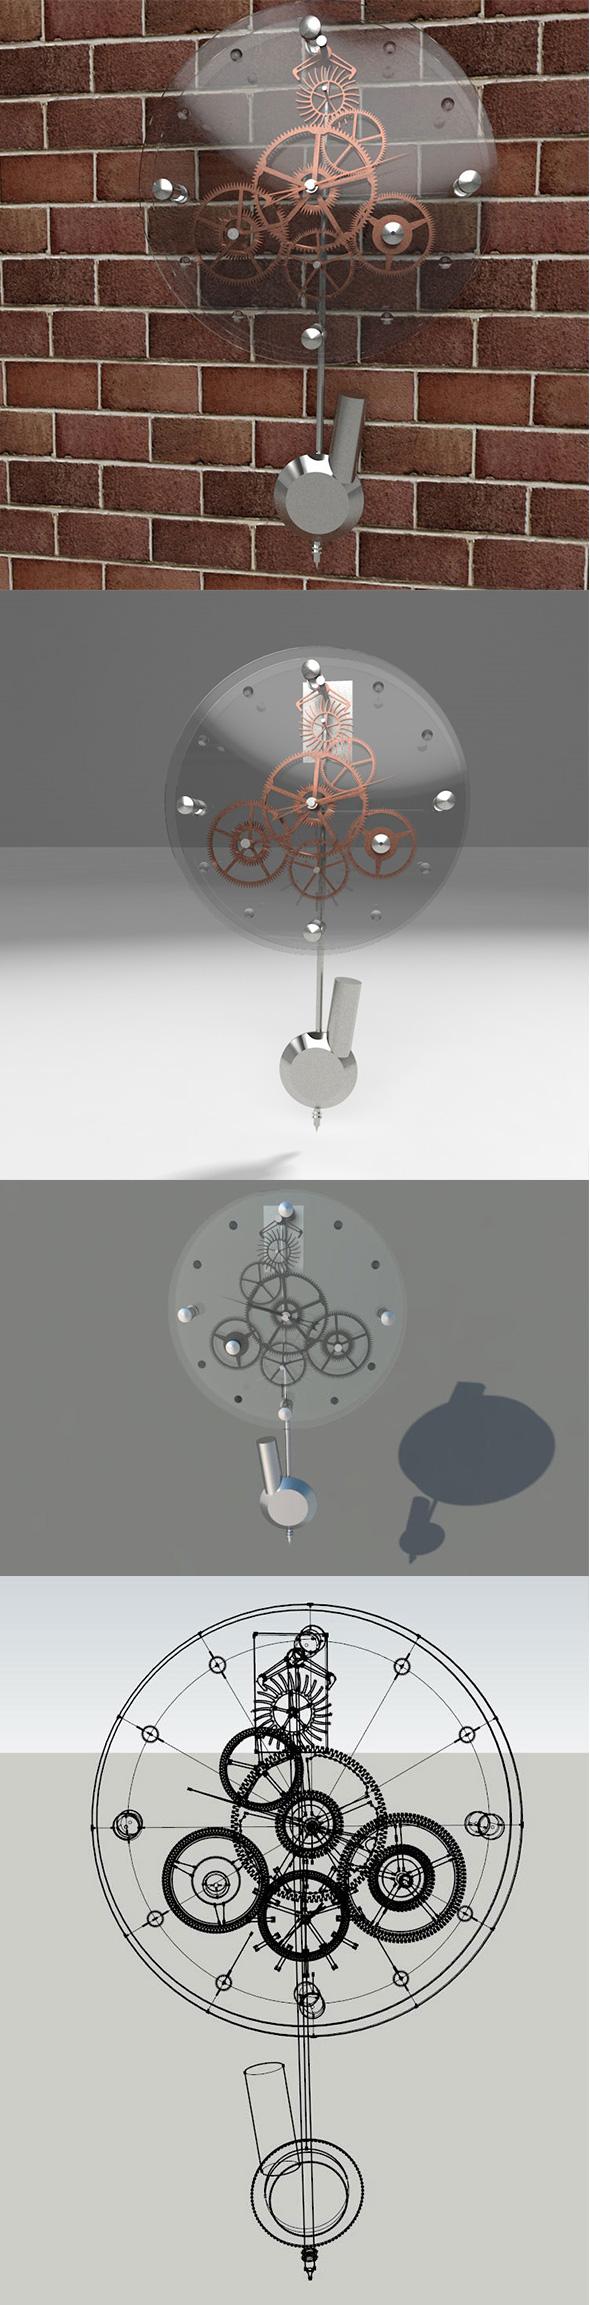 Clock 3d Model - 3DOcean Item for Sale